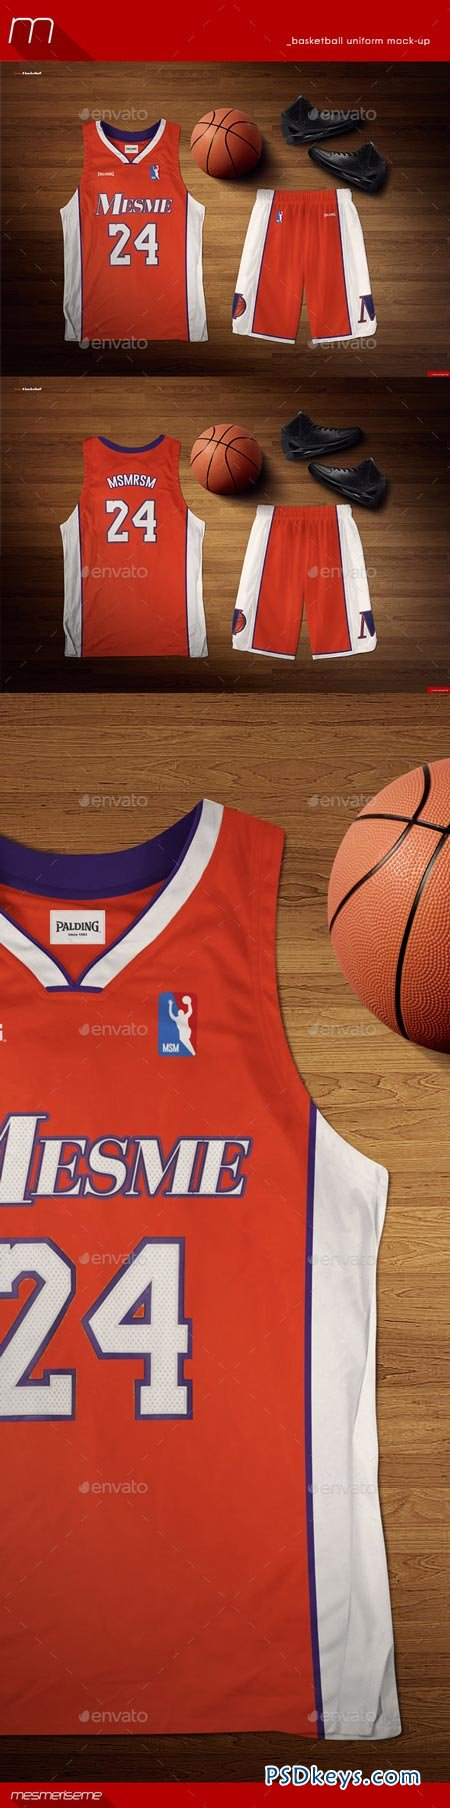 basketball uniform mock up 8892993 free download photoshop